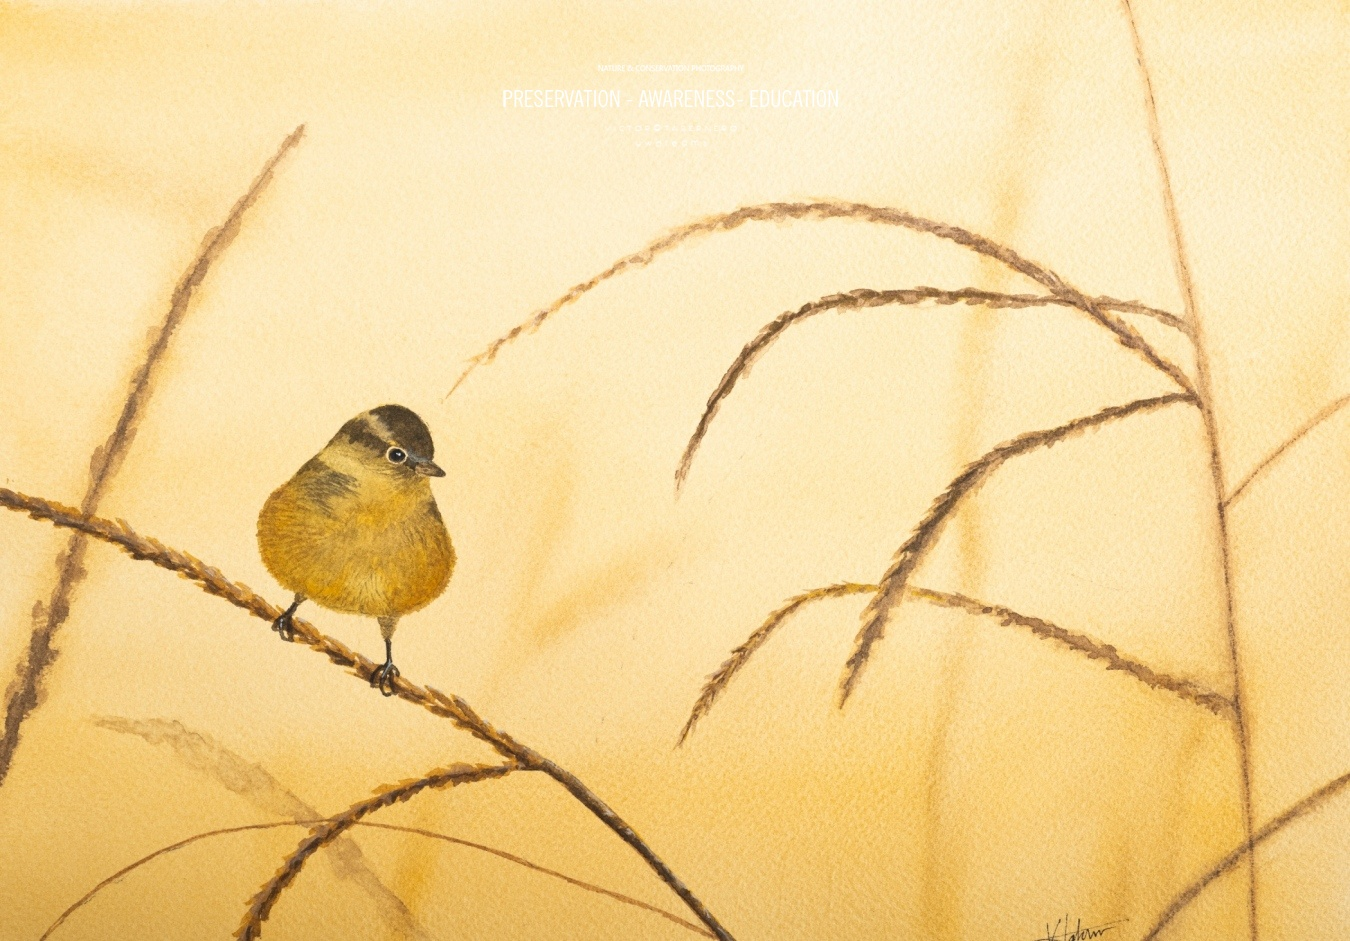 Ave al atardecer - 31x23cm - Vida Salvaje - Wildlife Conservation Photography, UWDREAMS.COM